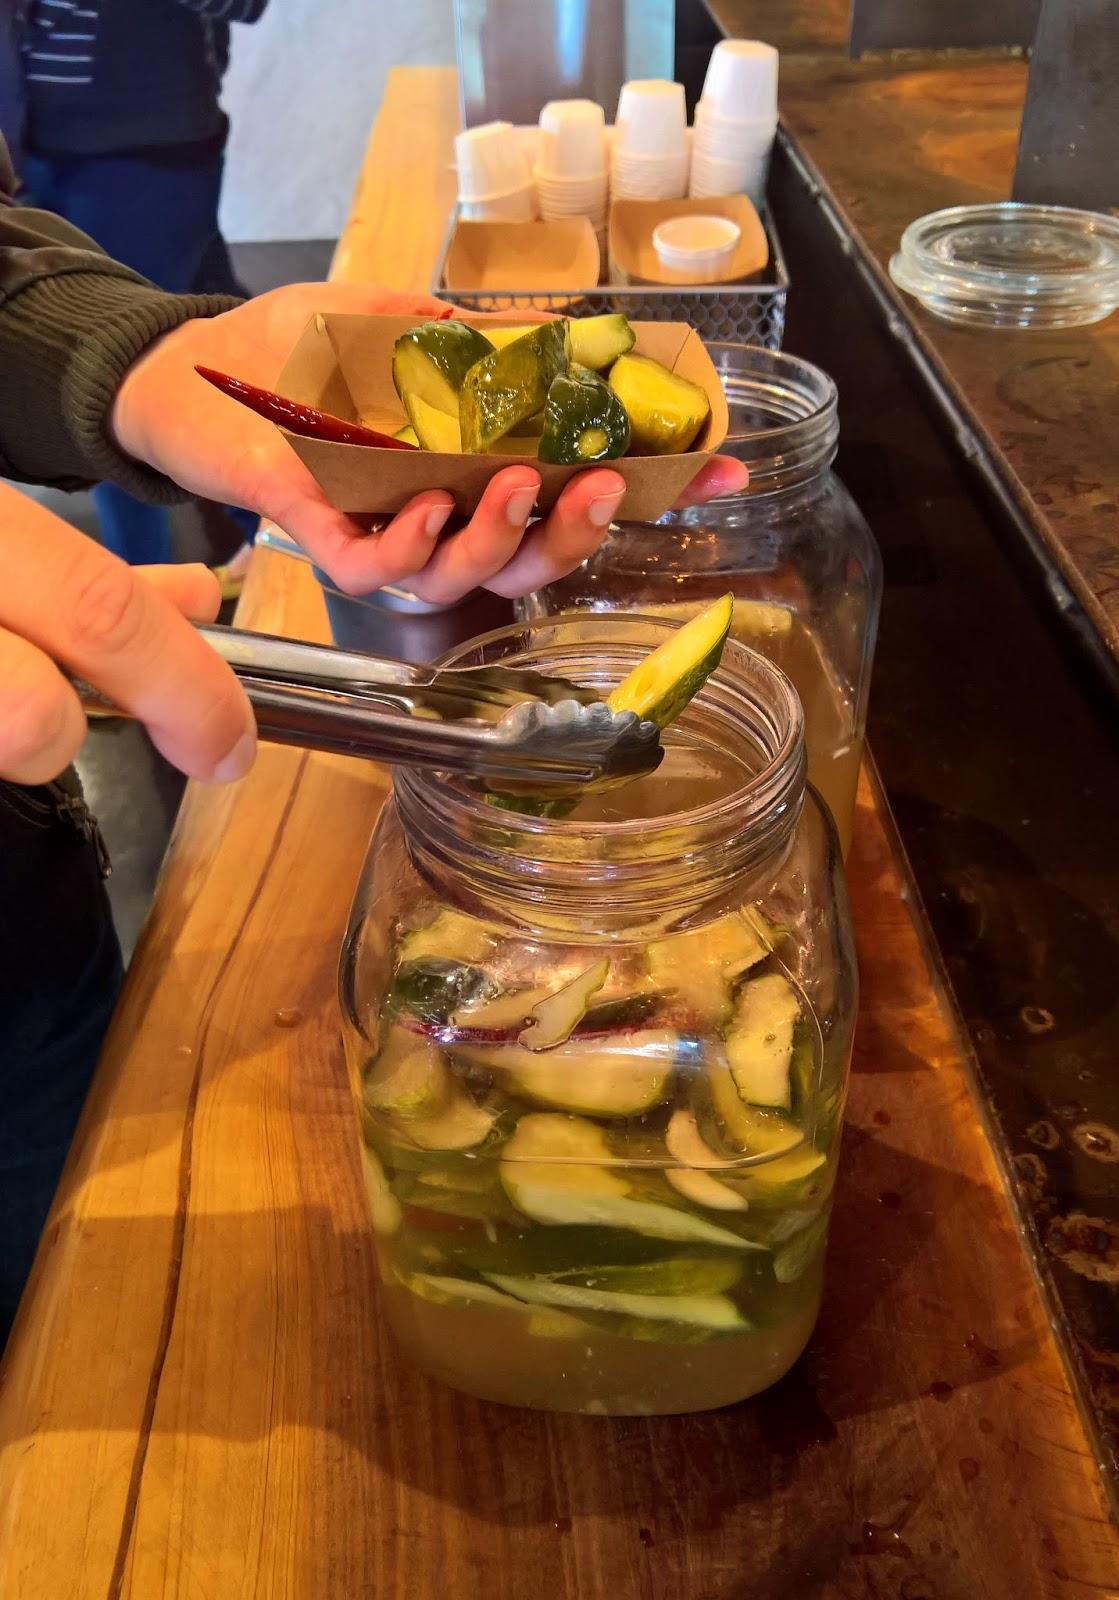 super duper burgers pikaruokaravintola san francisco california pickles pickled cucumber pikkelöity kurkku hampurilainen matkailu matkajuttu mallaspulla